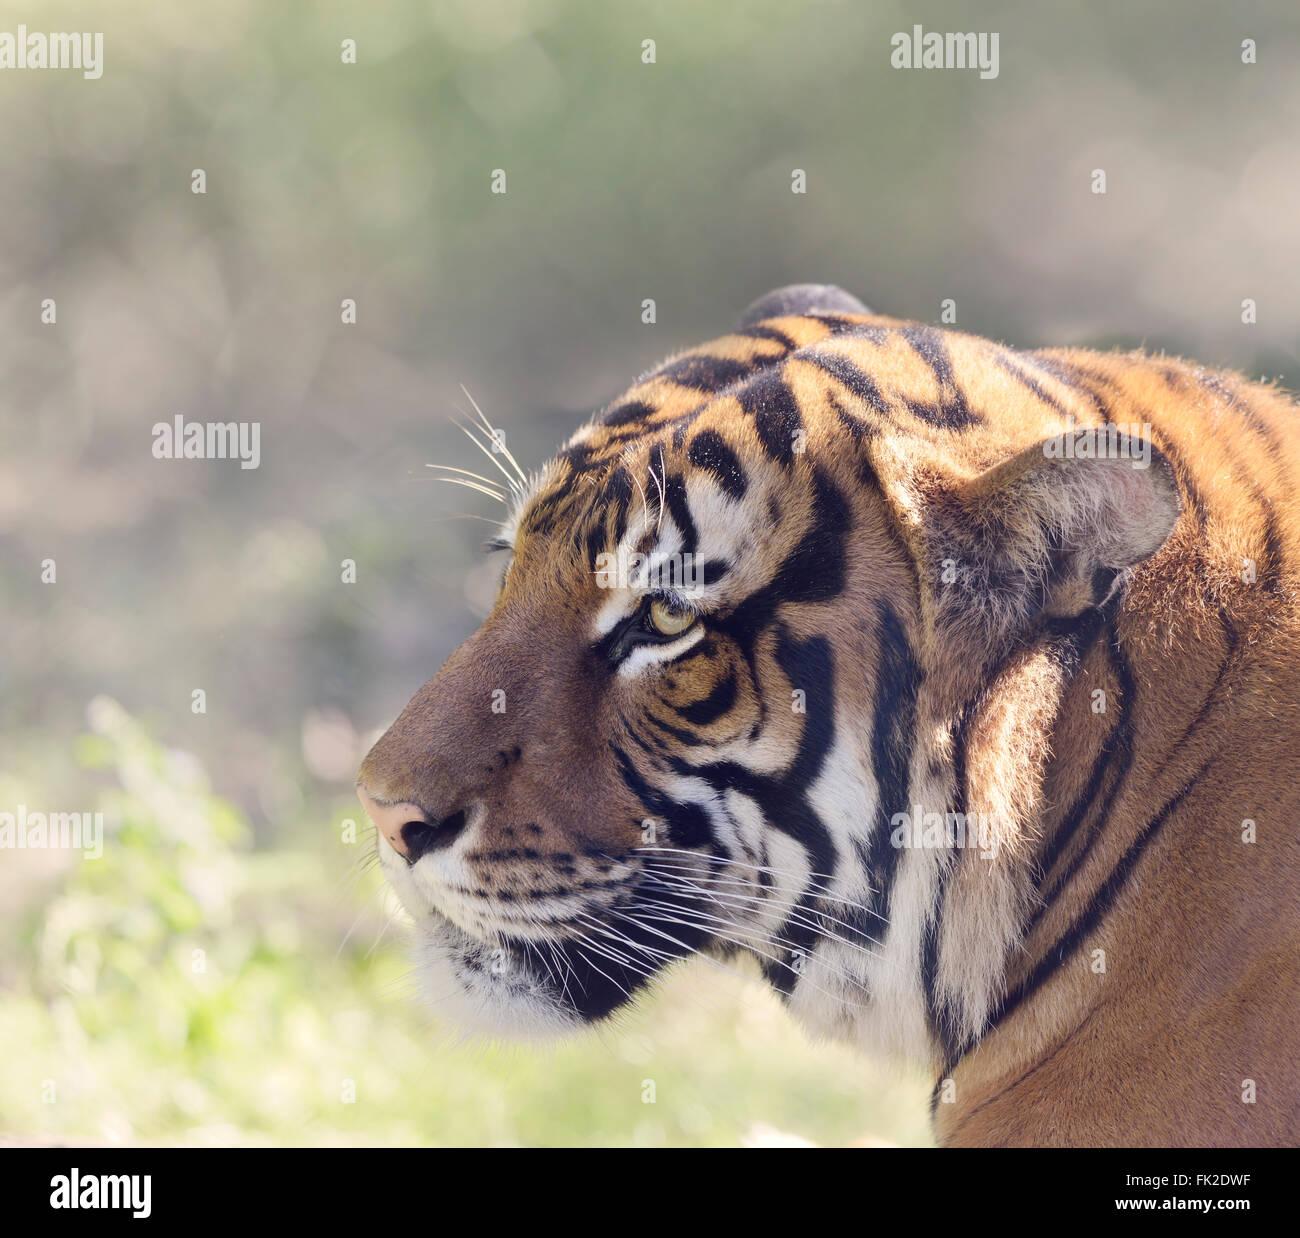 Tiger Head,Close Up Shot - Stock Image